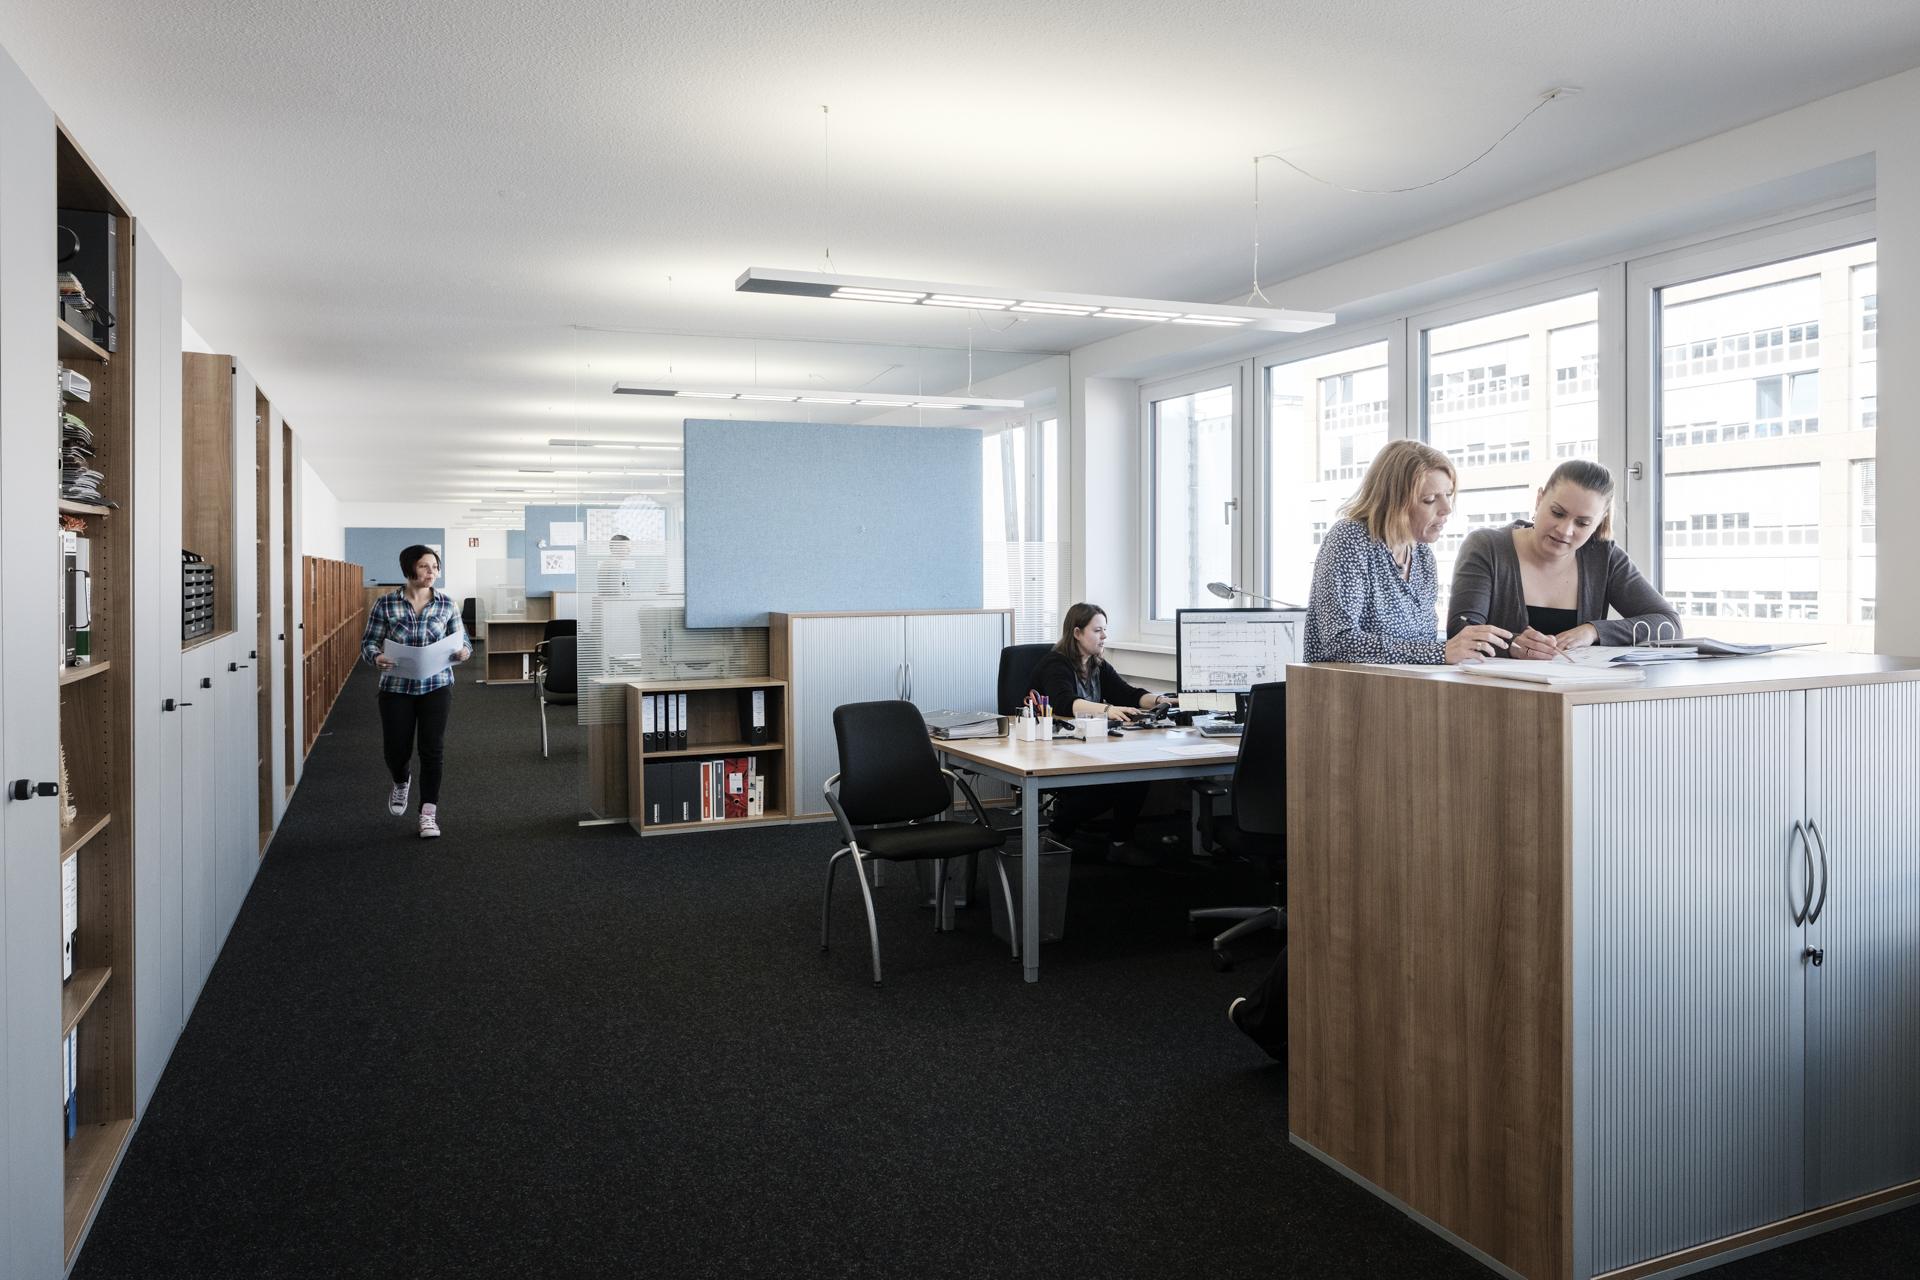 DEU, Koeln, 28.03.2017, Raumtechnik Messebau & Event Services GmbH